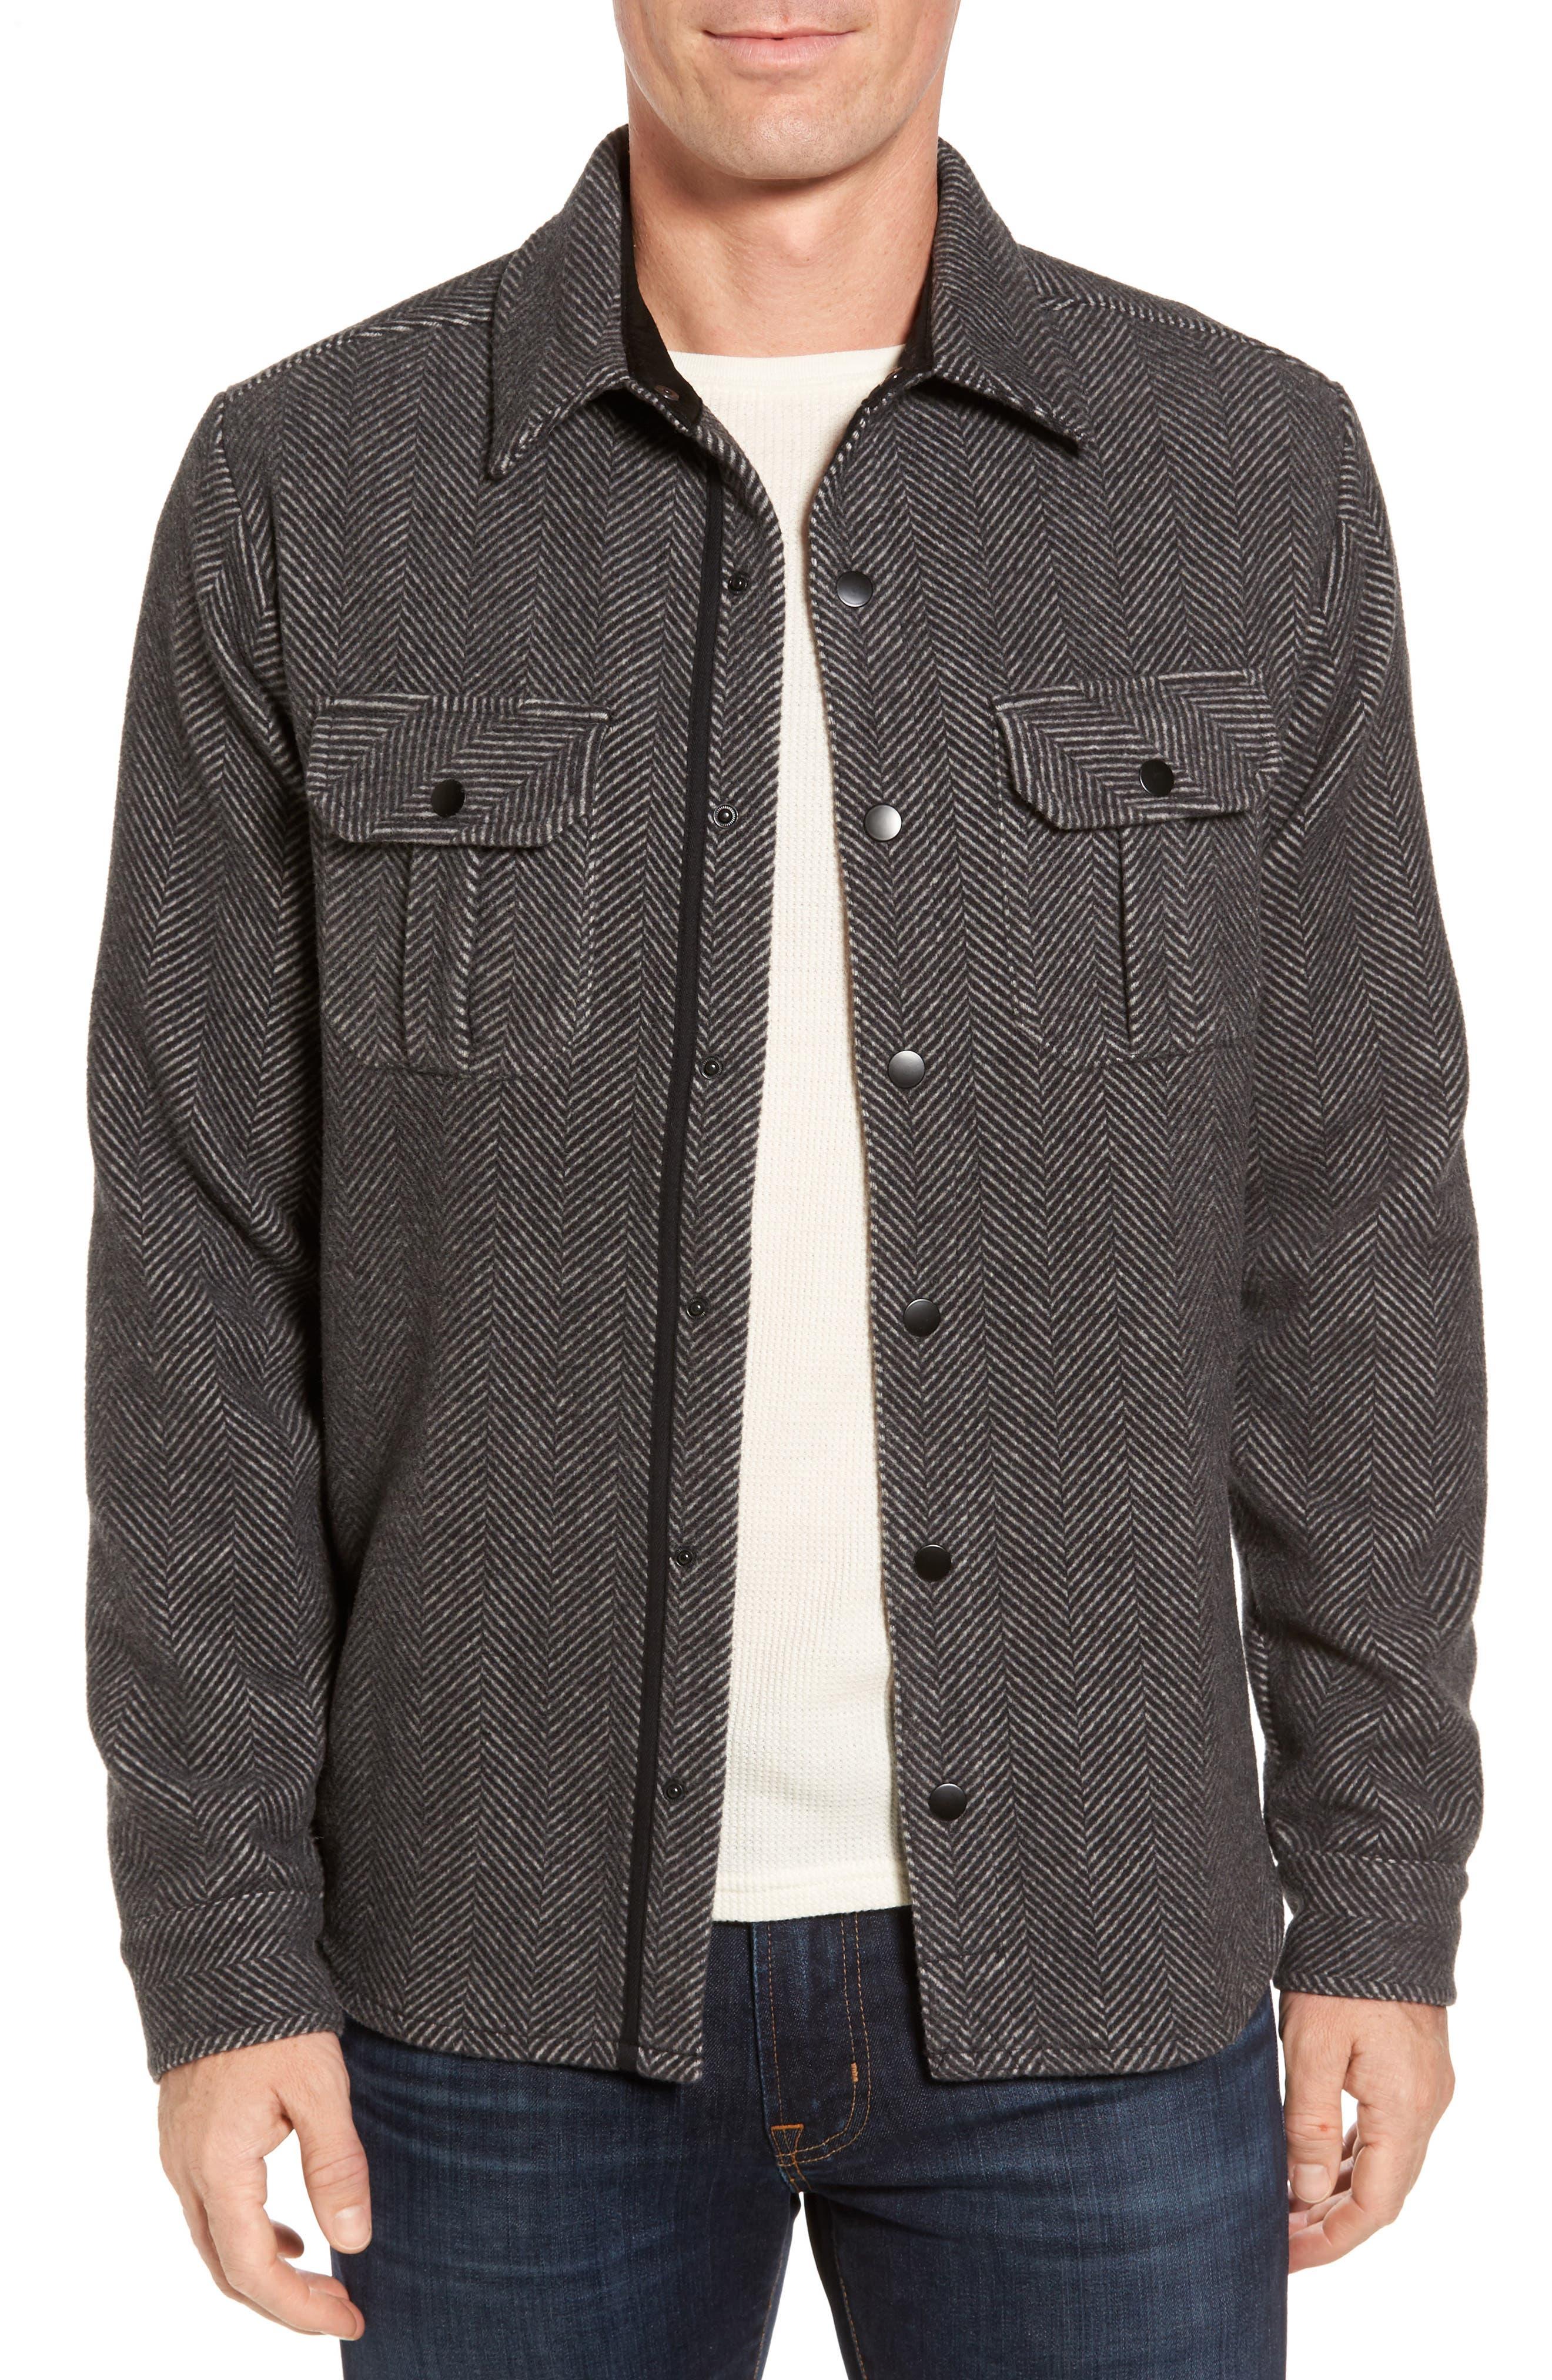 SmartWool Anchor Line Herringbone Wool Blend Shirt Jacket